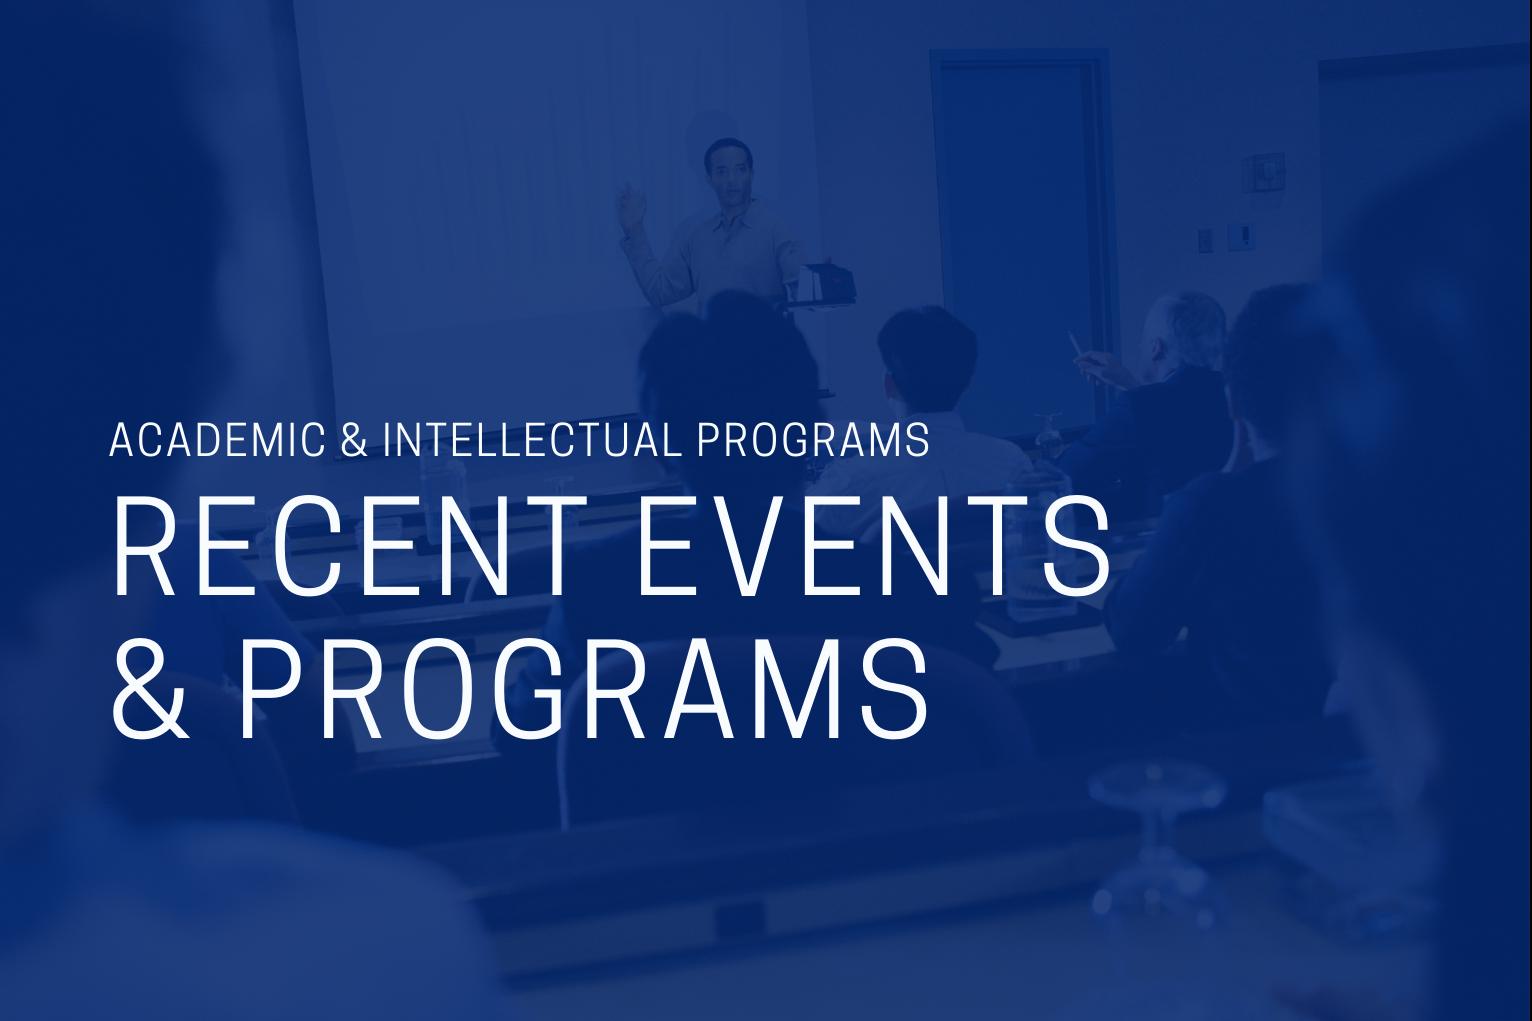 Slideshow Cover for Academic Programs